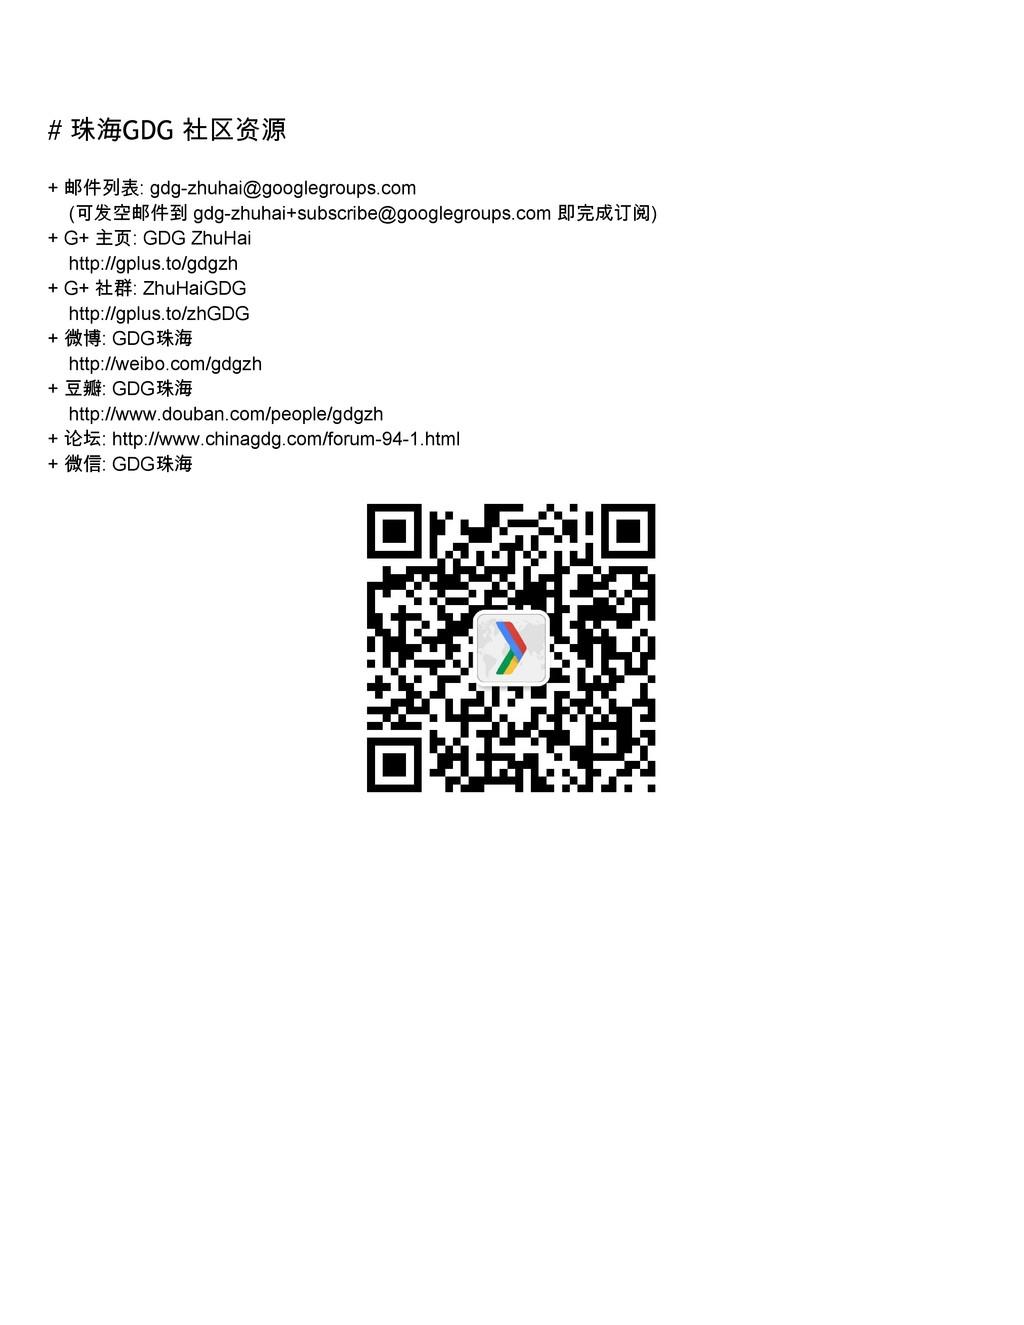 # 珠海GDG 社区资源 + 邮件列表: gdgzhuhai@googlegroups.co...